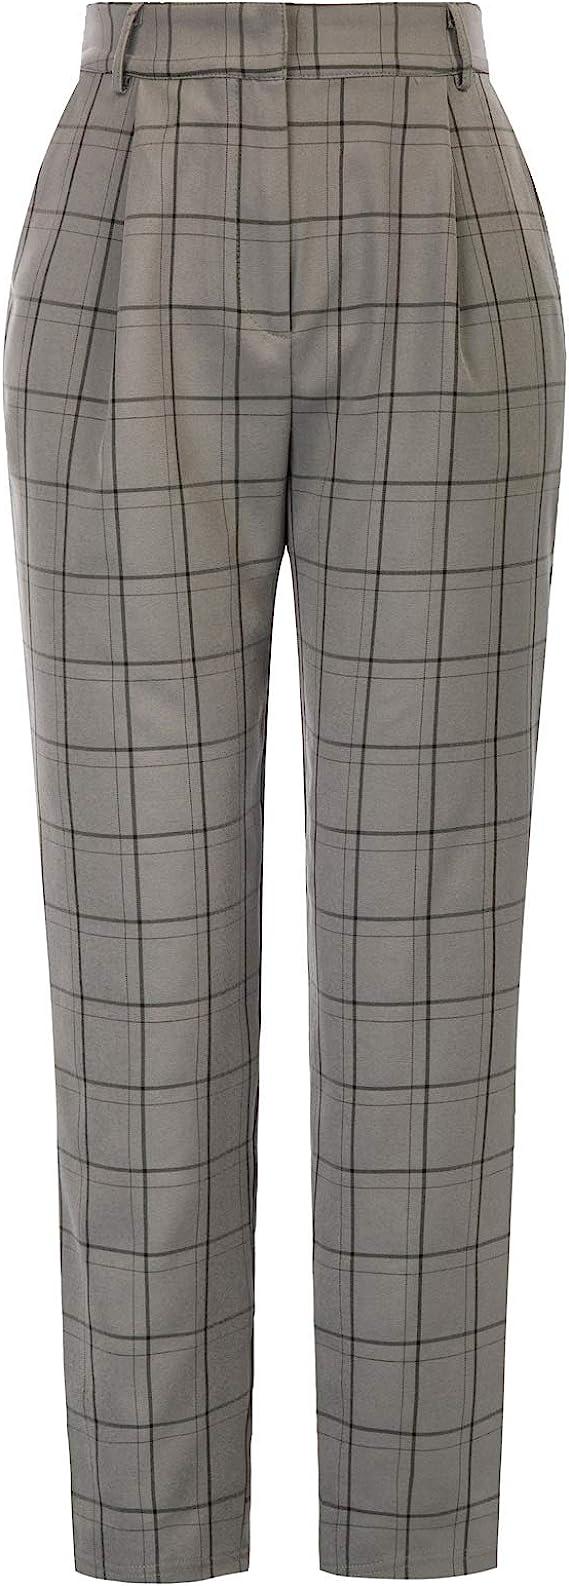 80s Jeans, Pants, Leggings | 90s Jeans GRACE KARIN Womens Ankle Length Pants with Pockets Plaided OL Elastic Waist  AT vintagedancer.com